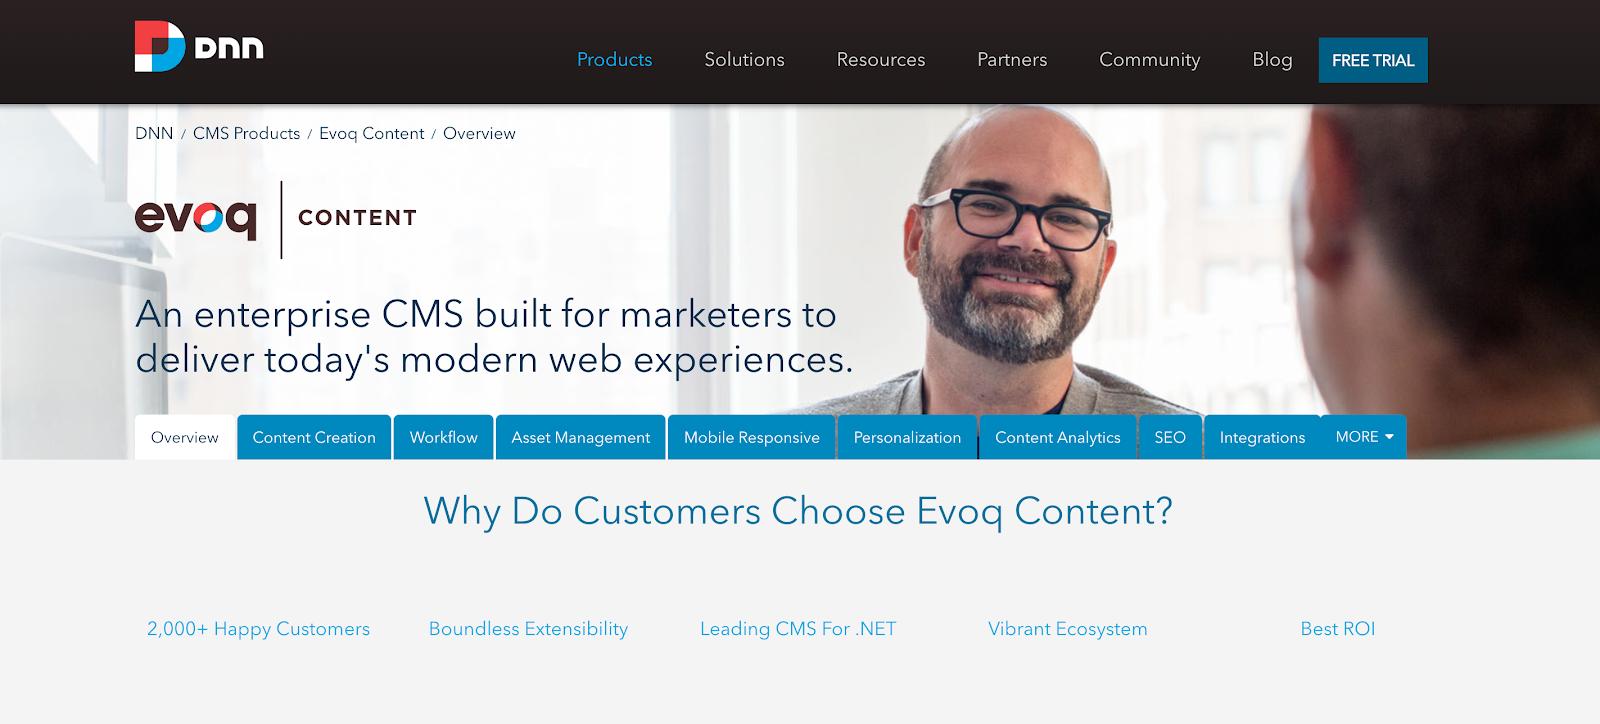 Evoq Content is an enterprise software platform focused on .NET applications